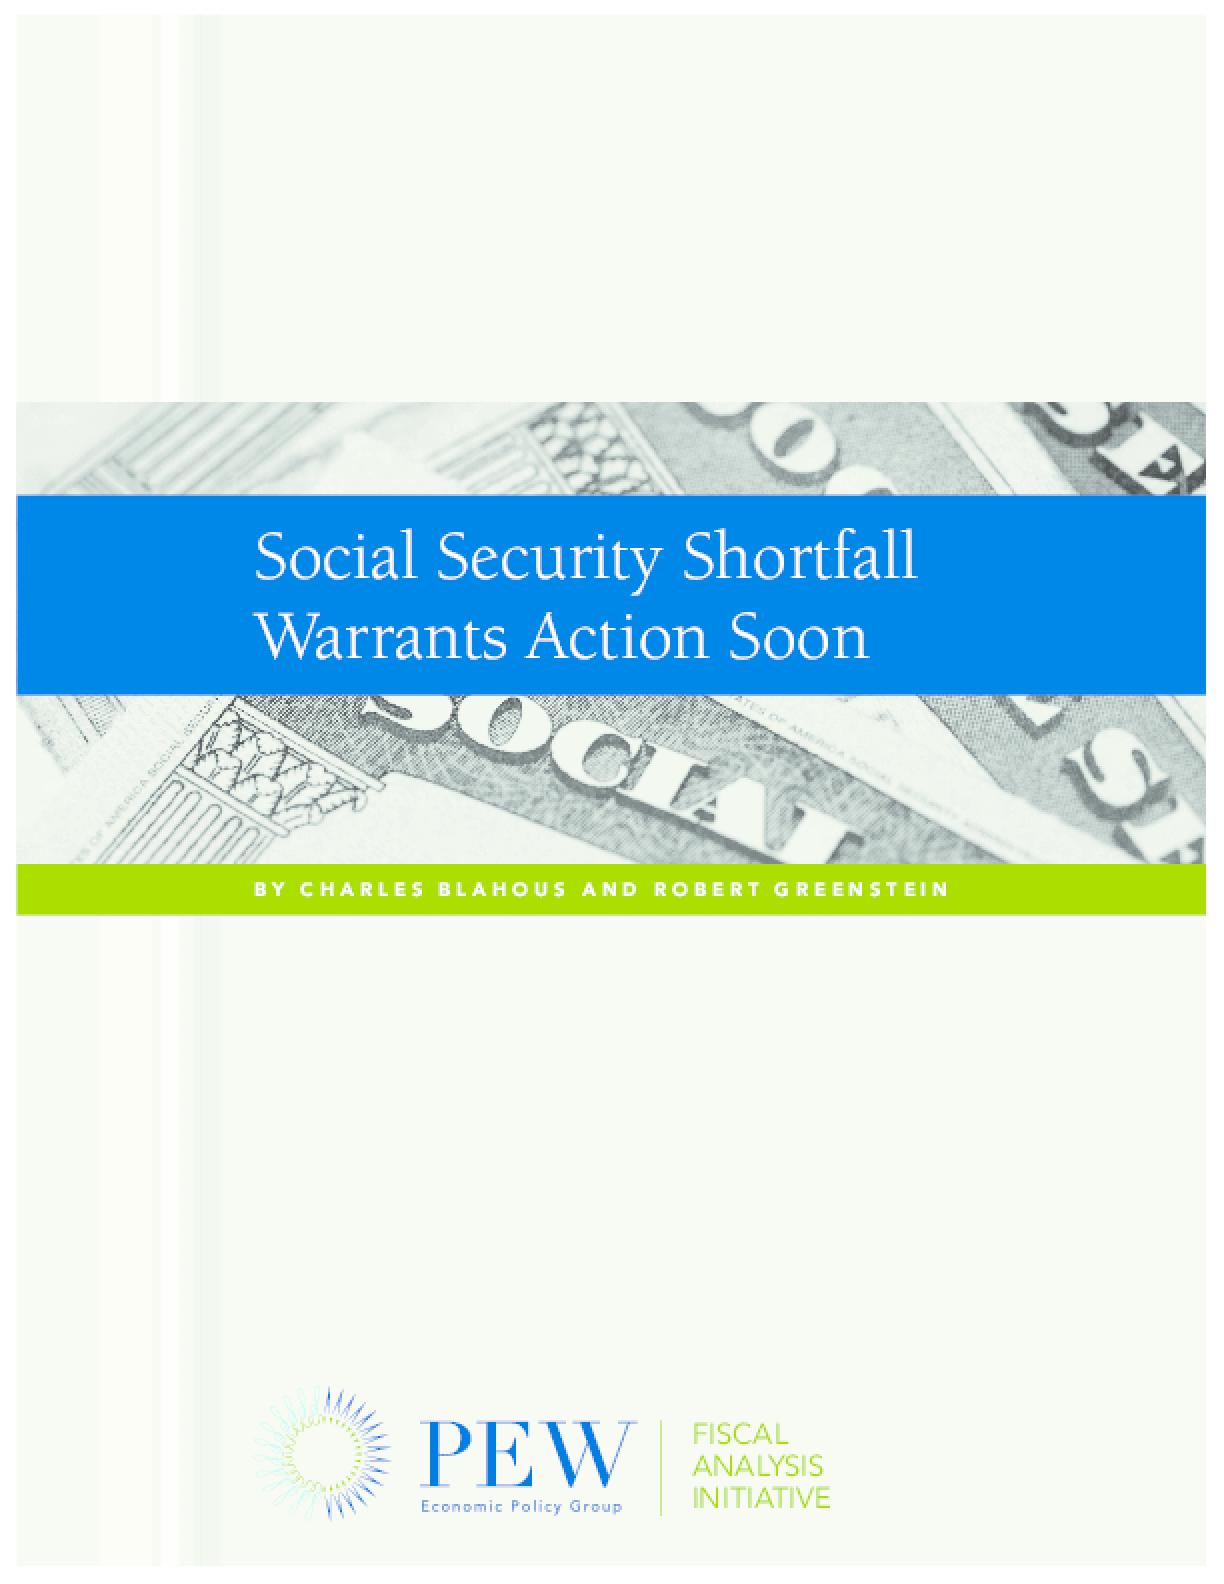 Social Security Shortfall Warrants Action Soon